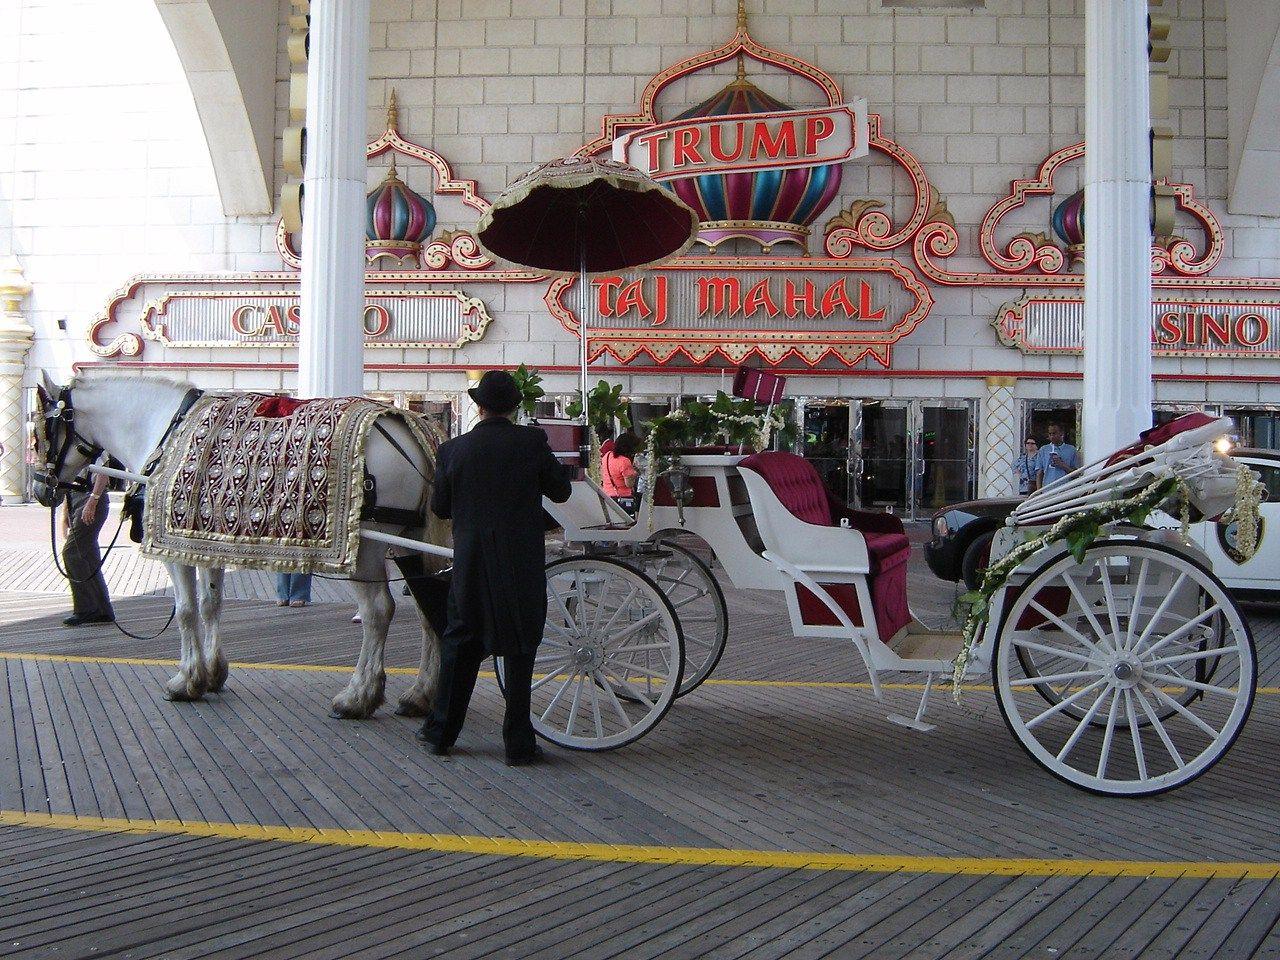 Indian Wedding on the Boardwalk at Trump Taj Mahal